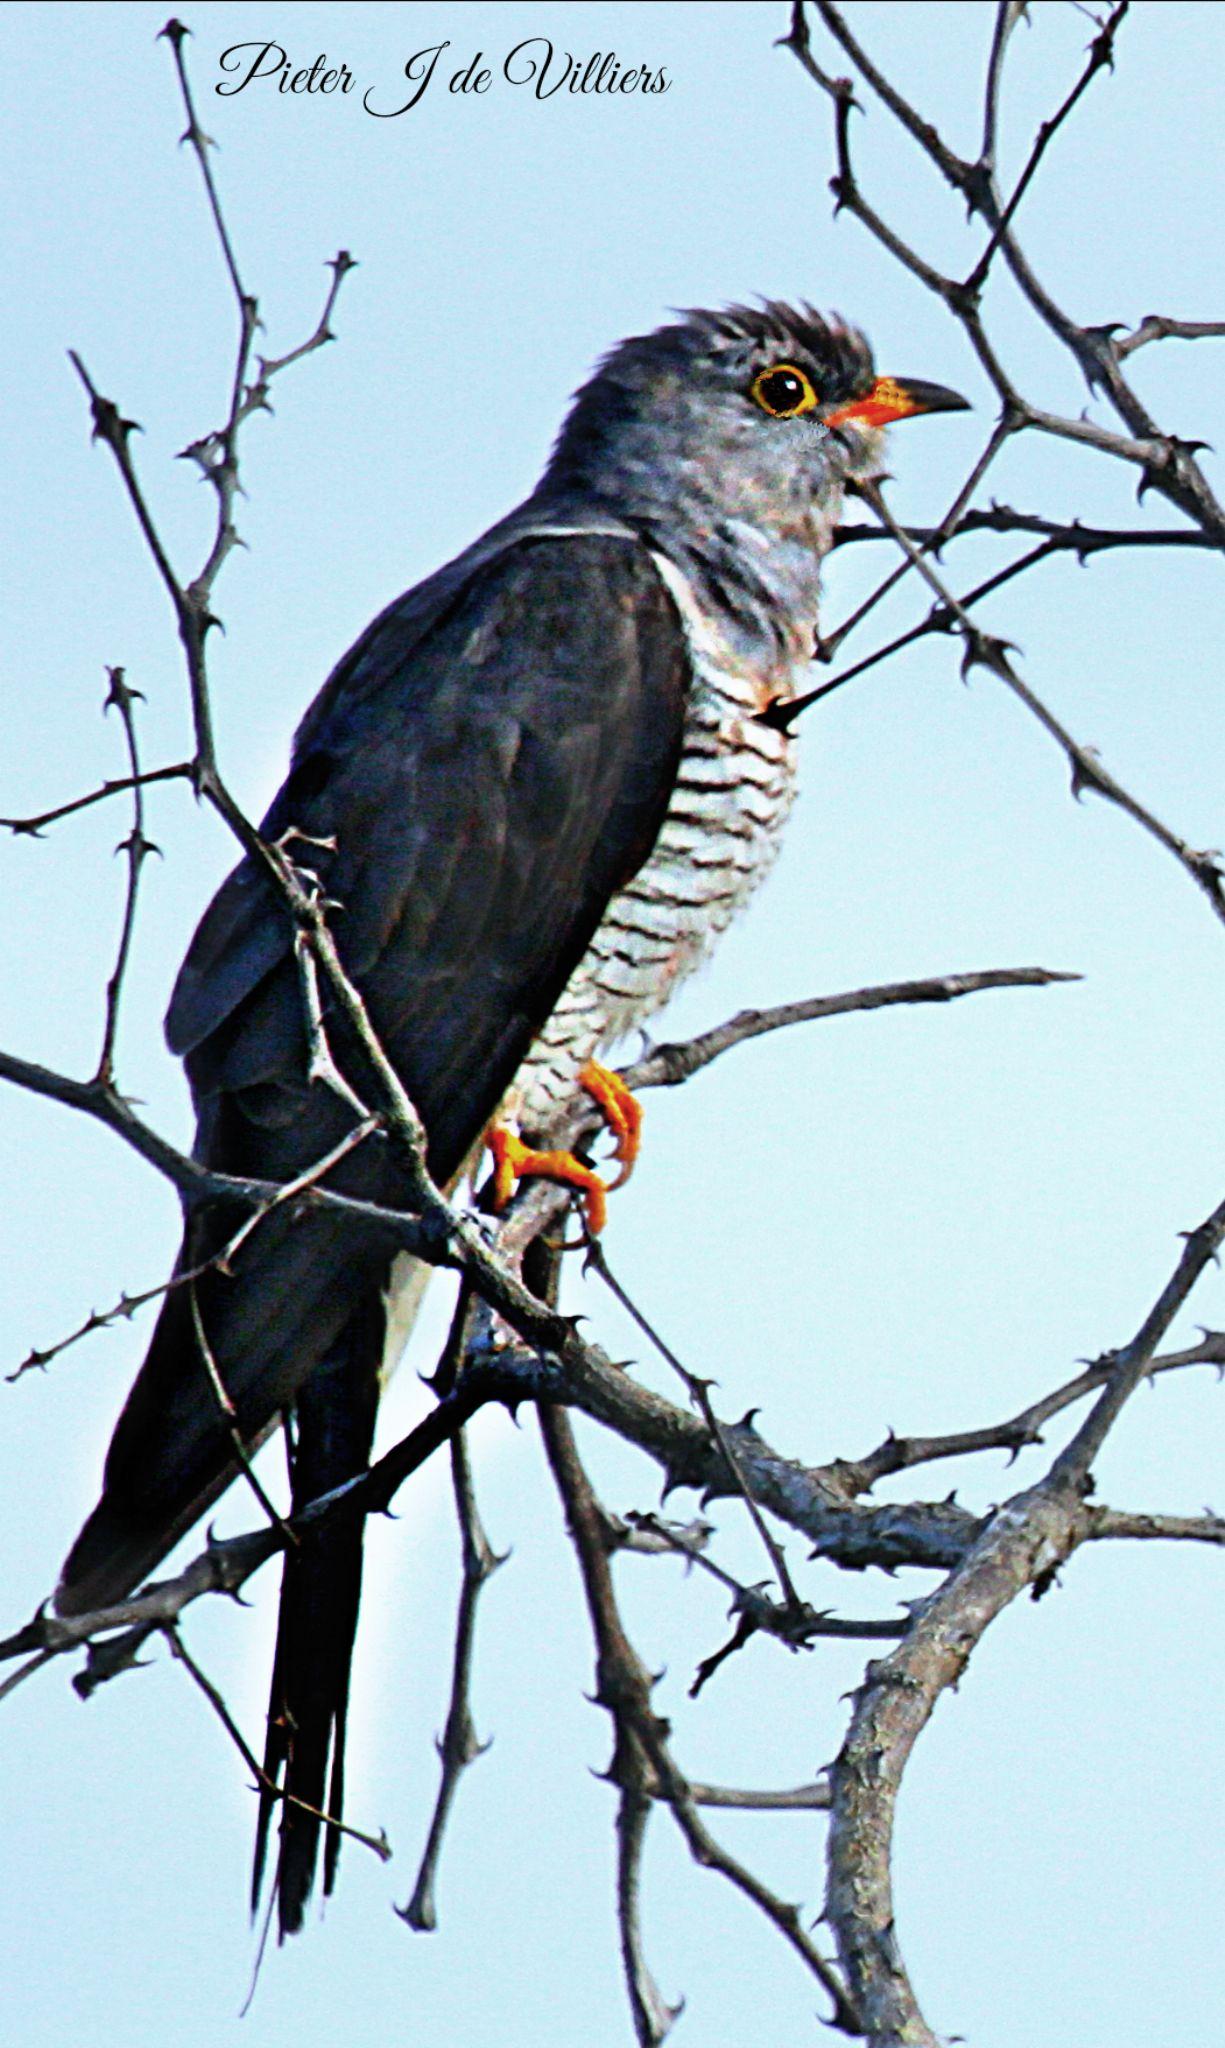 African Cuckoo by Pieter J de Villiers